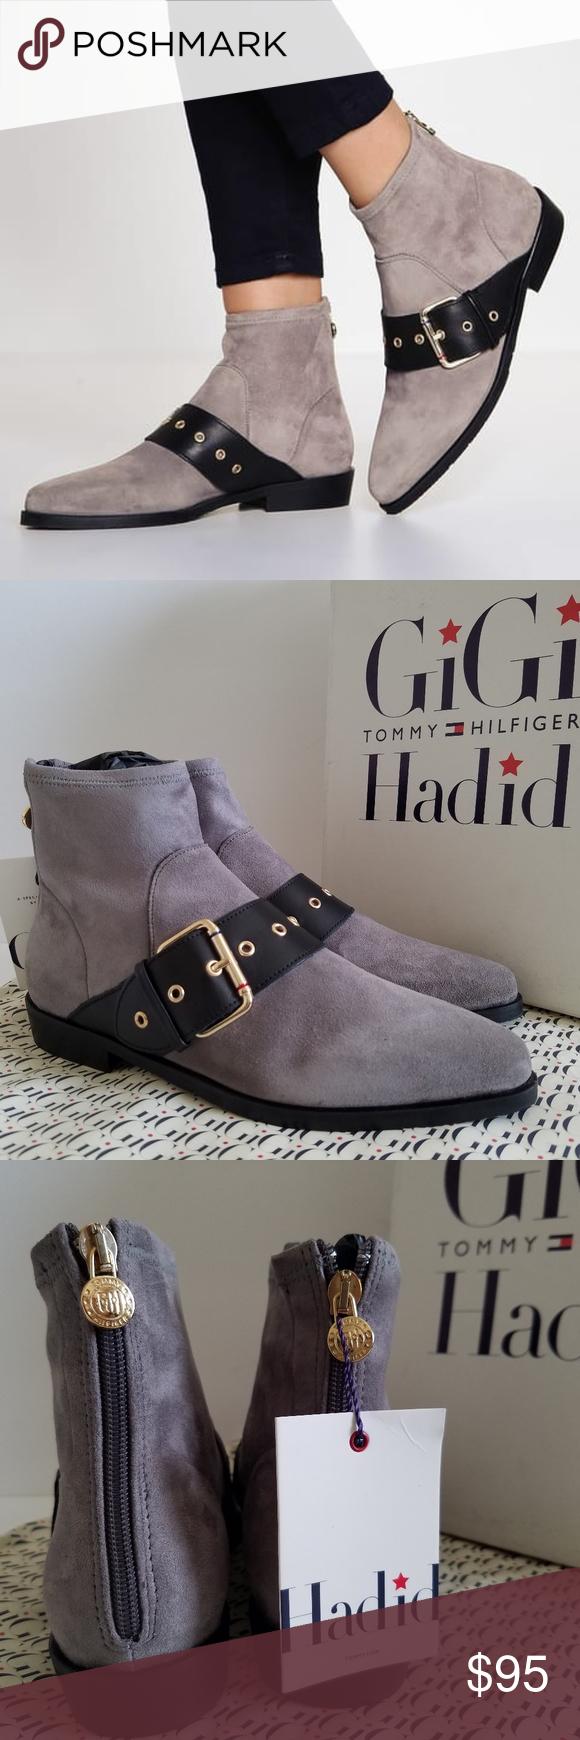 84d8c328bbc8c Tommy Hilfiger GIGI HADID Grey Ankle Flat Boots EUR Size 38 Original Price   179.50 Material